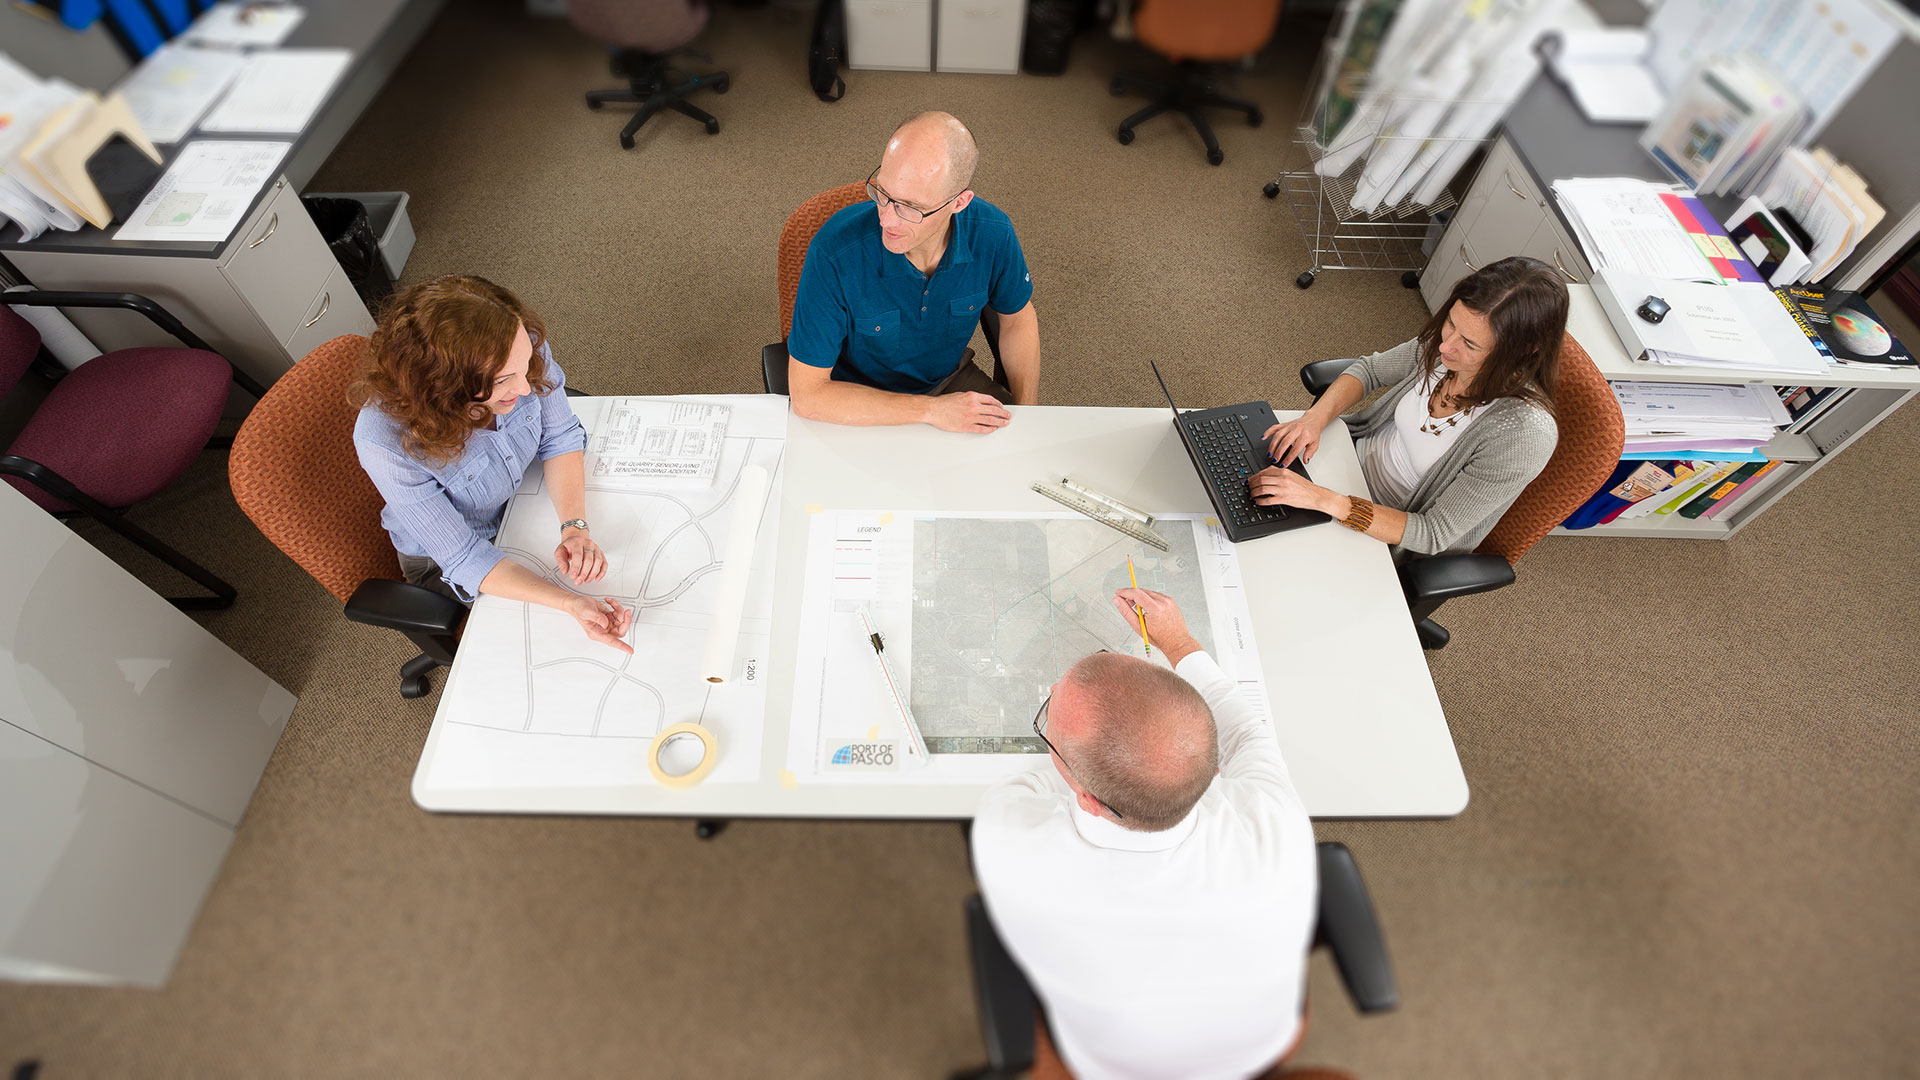 Landscape architecture team